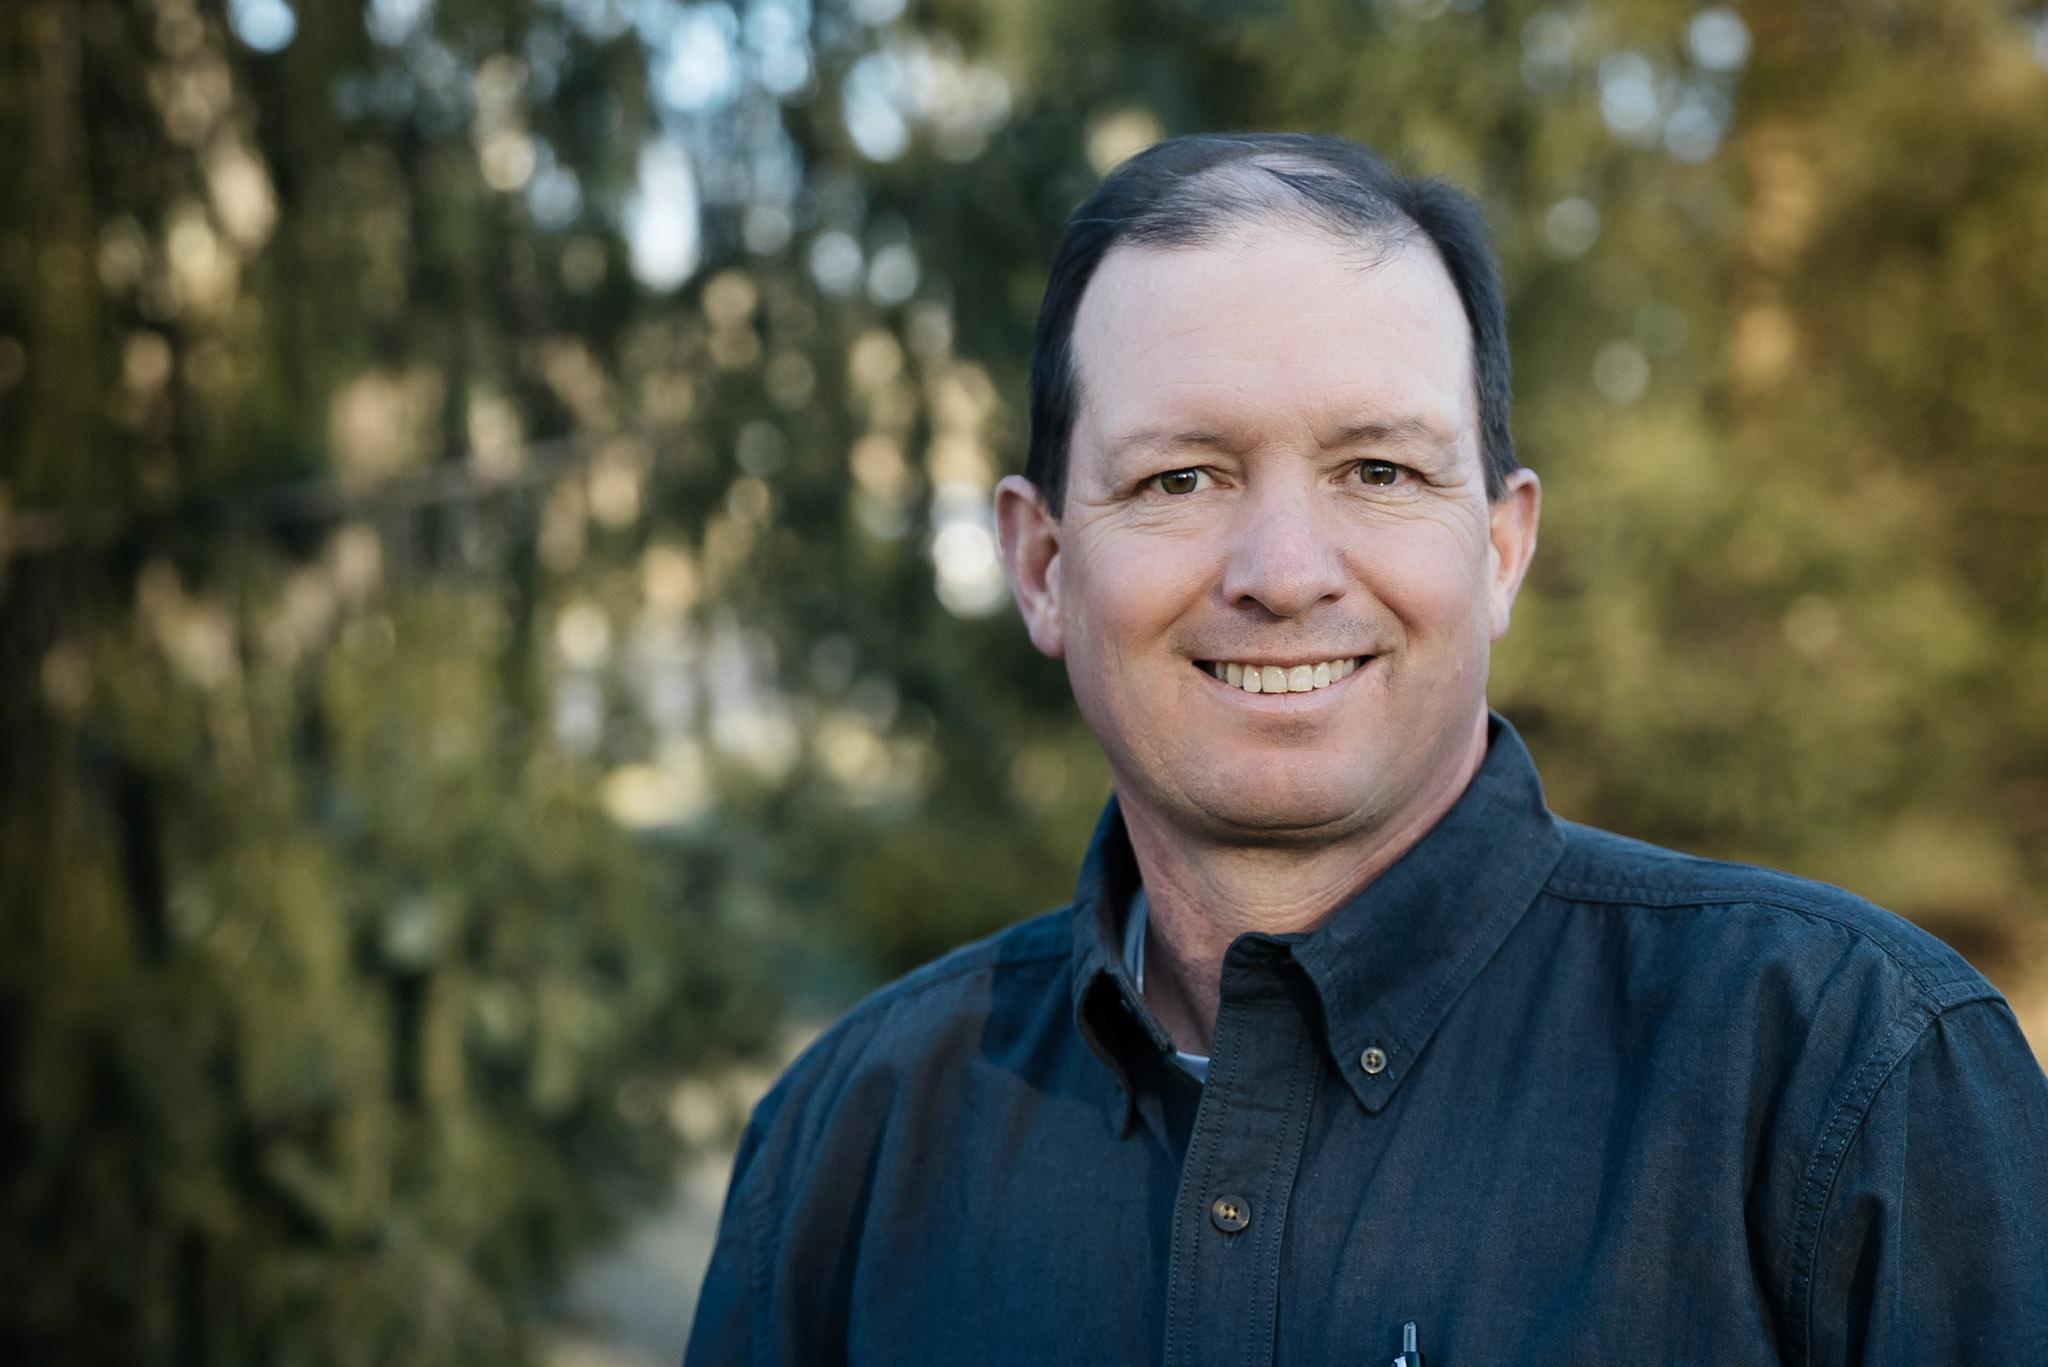 Director of Construction Chris Pedigo